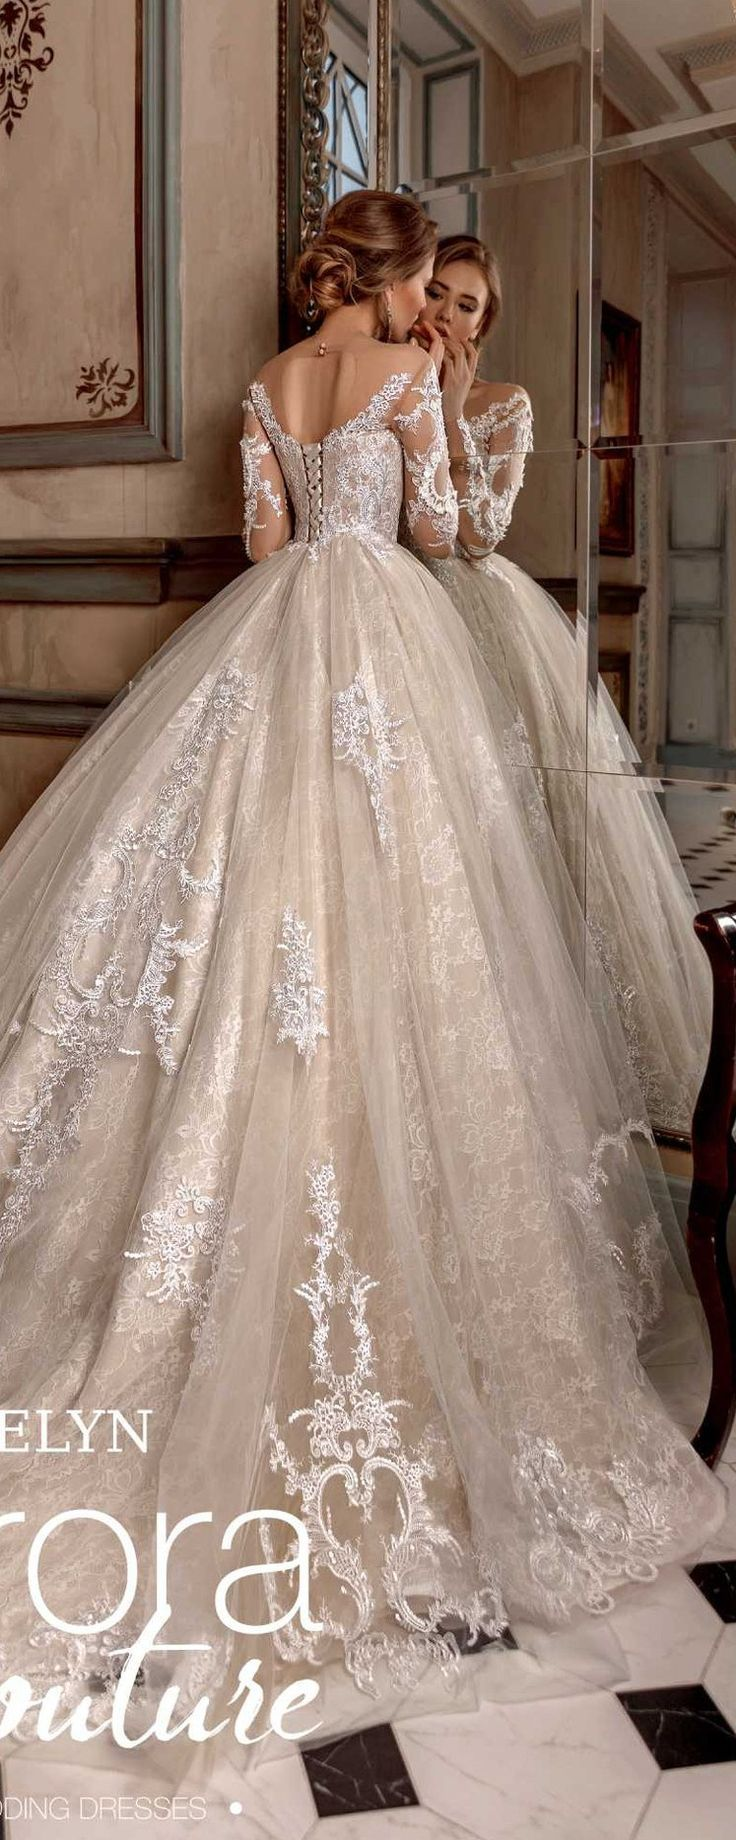 Ball gown, wedding dress, EVELYN, wedding dresses, bridal dress ...